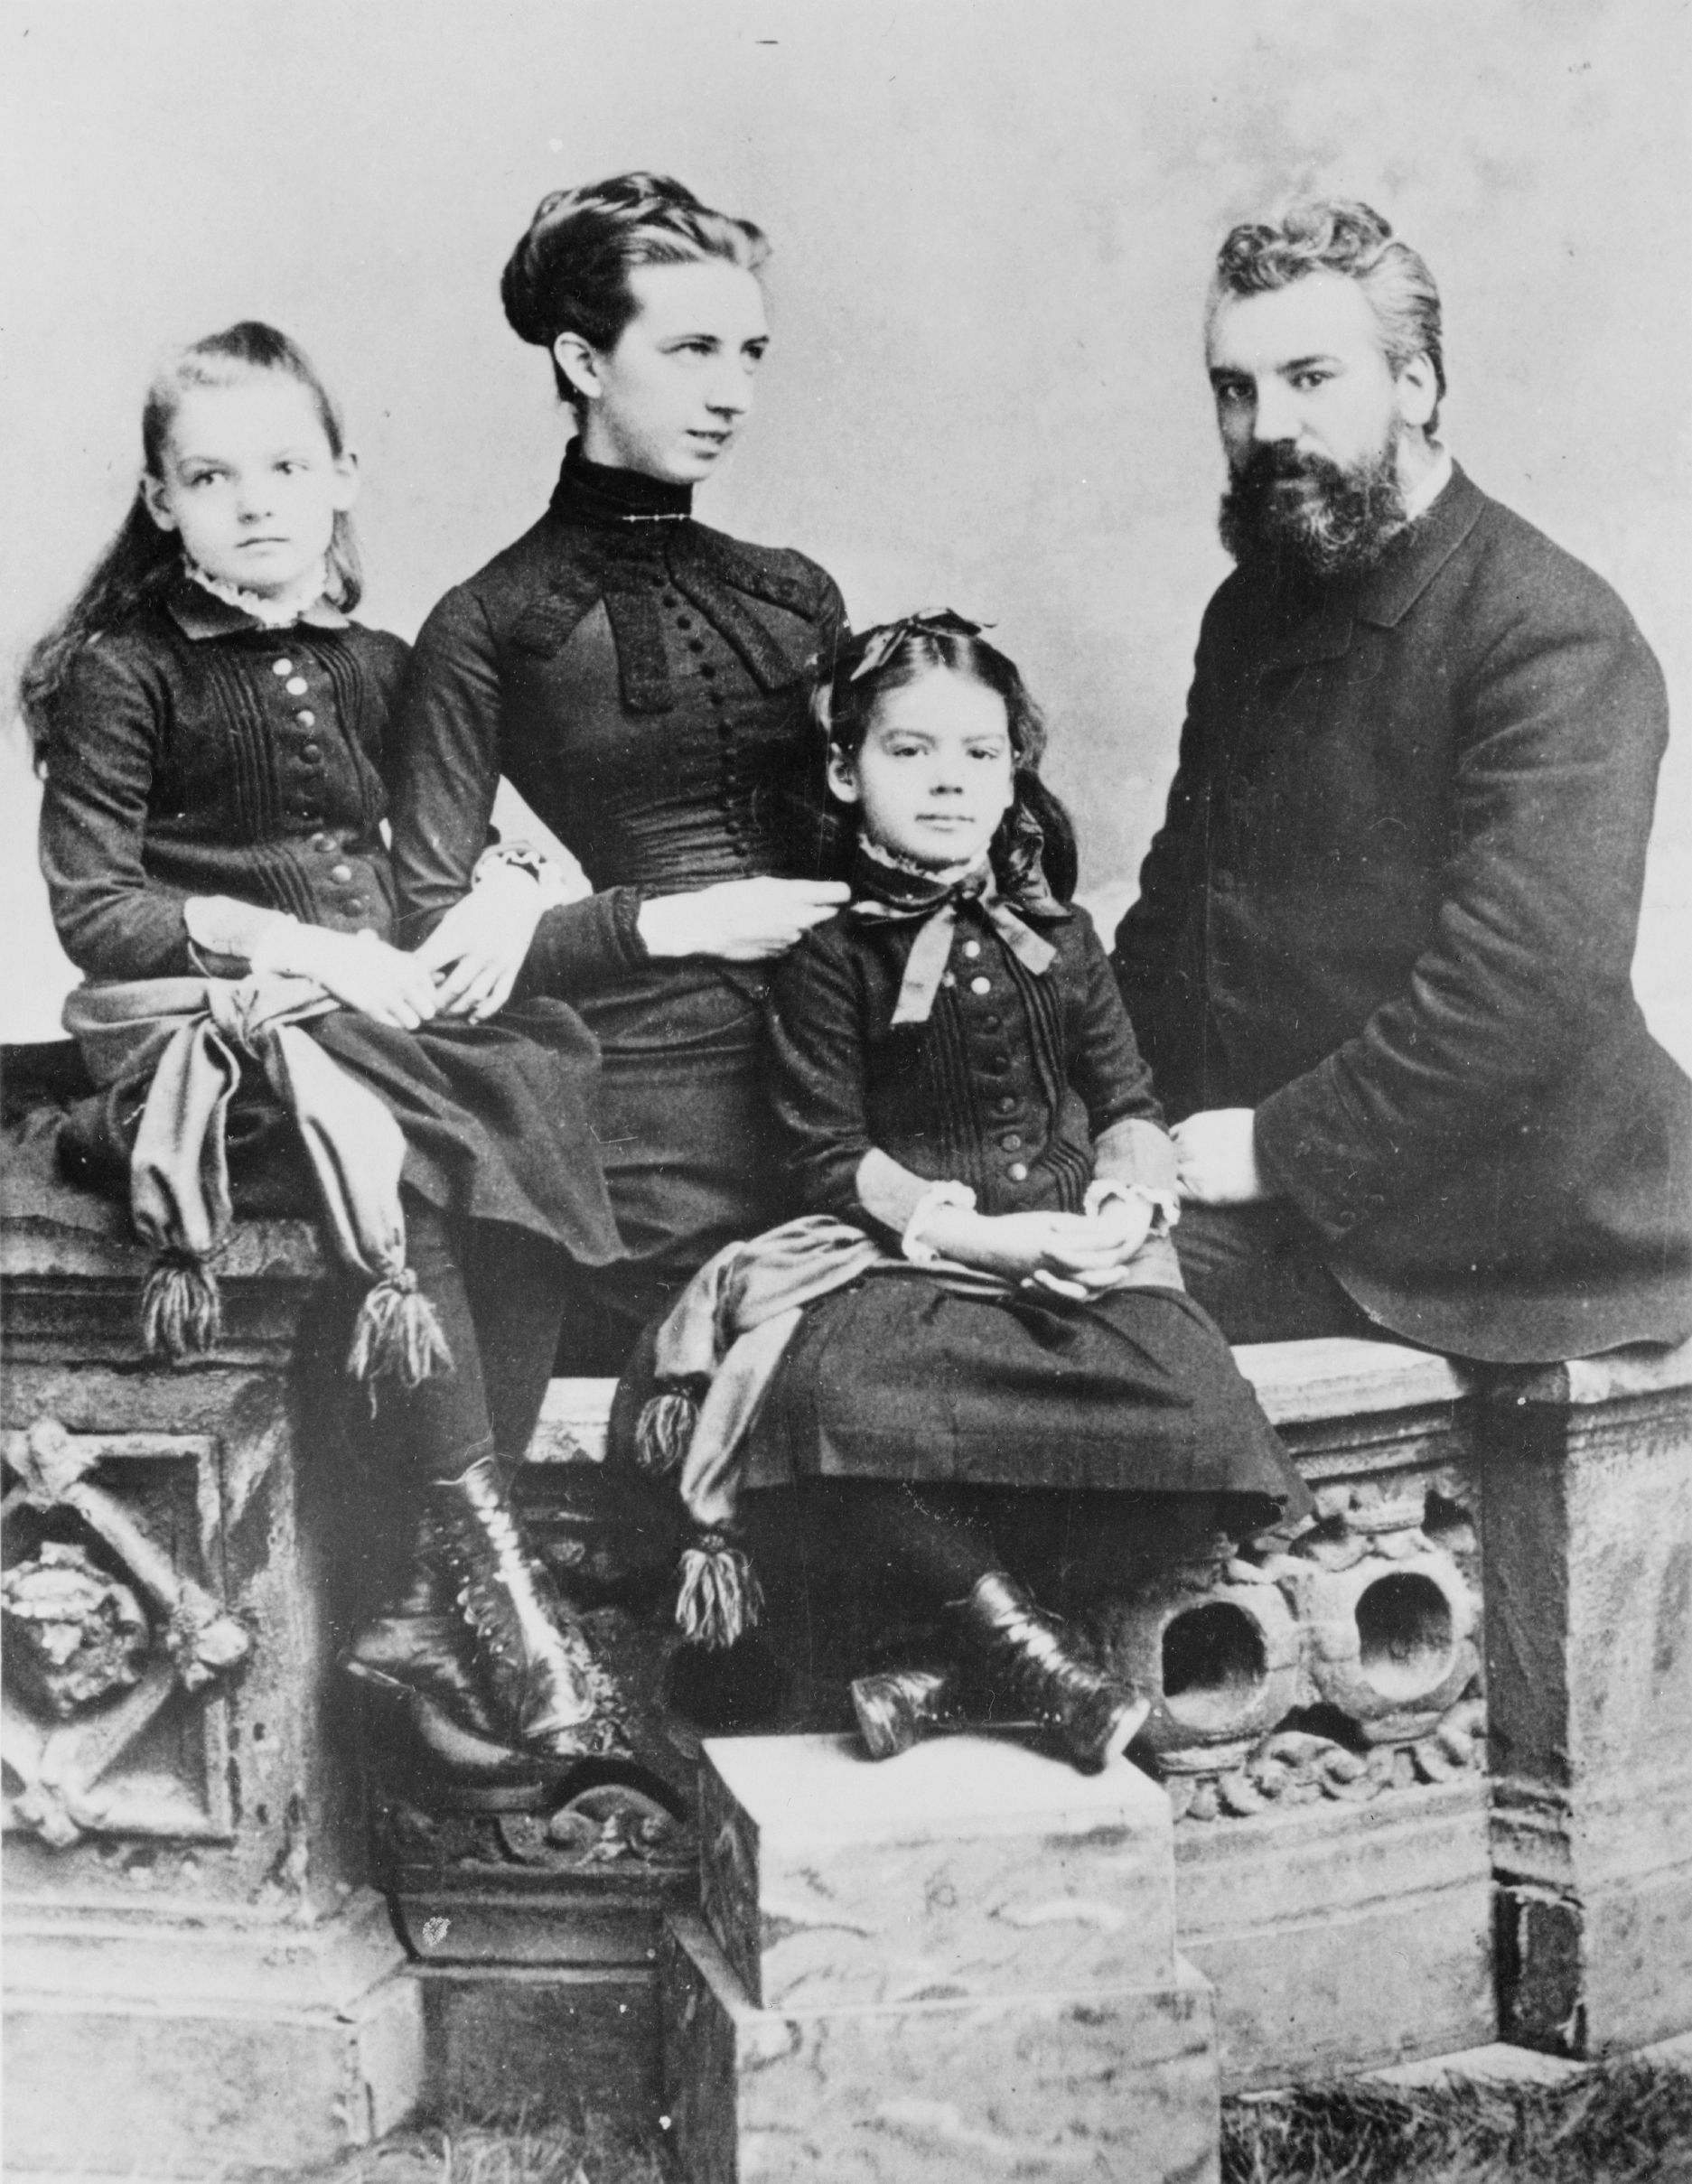 Alexander Graham Bell Scientist And Inventor Famous Scientist Alexander Graham Alexander Graham Bell